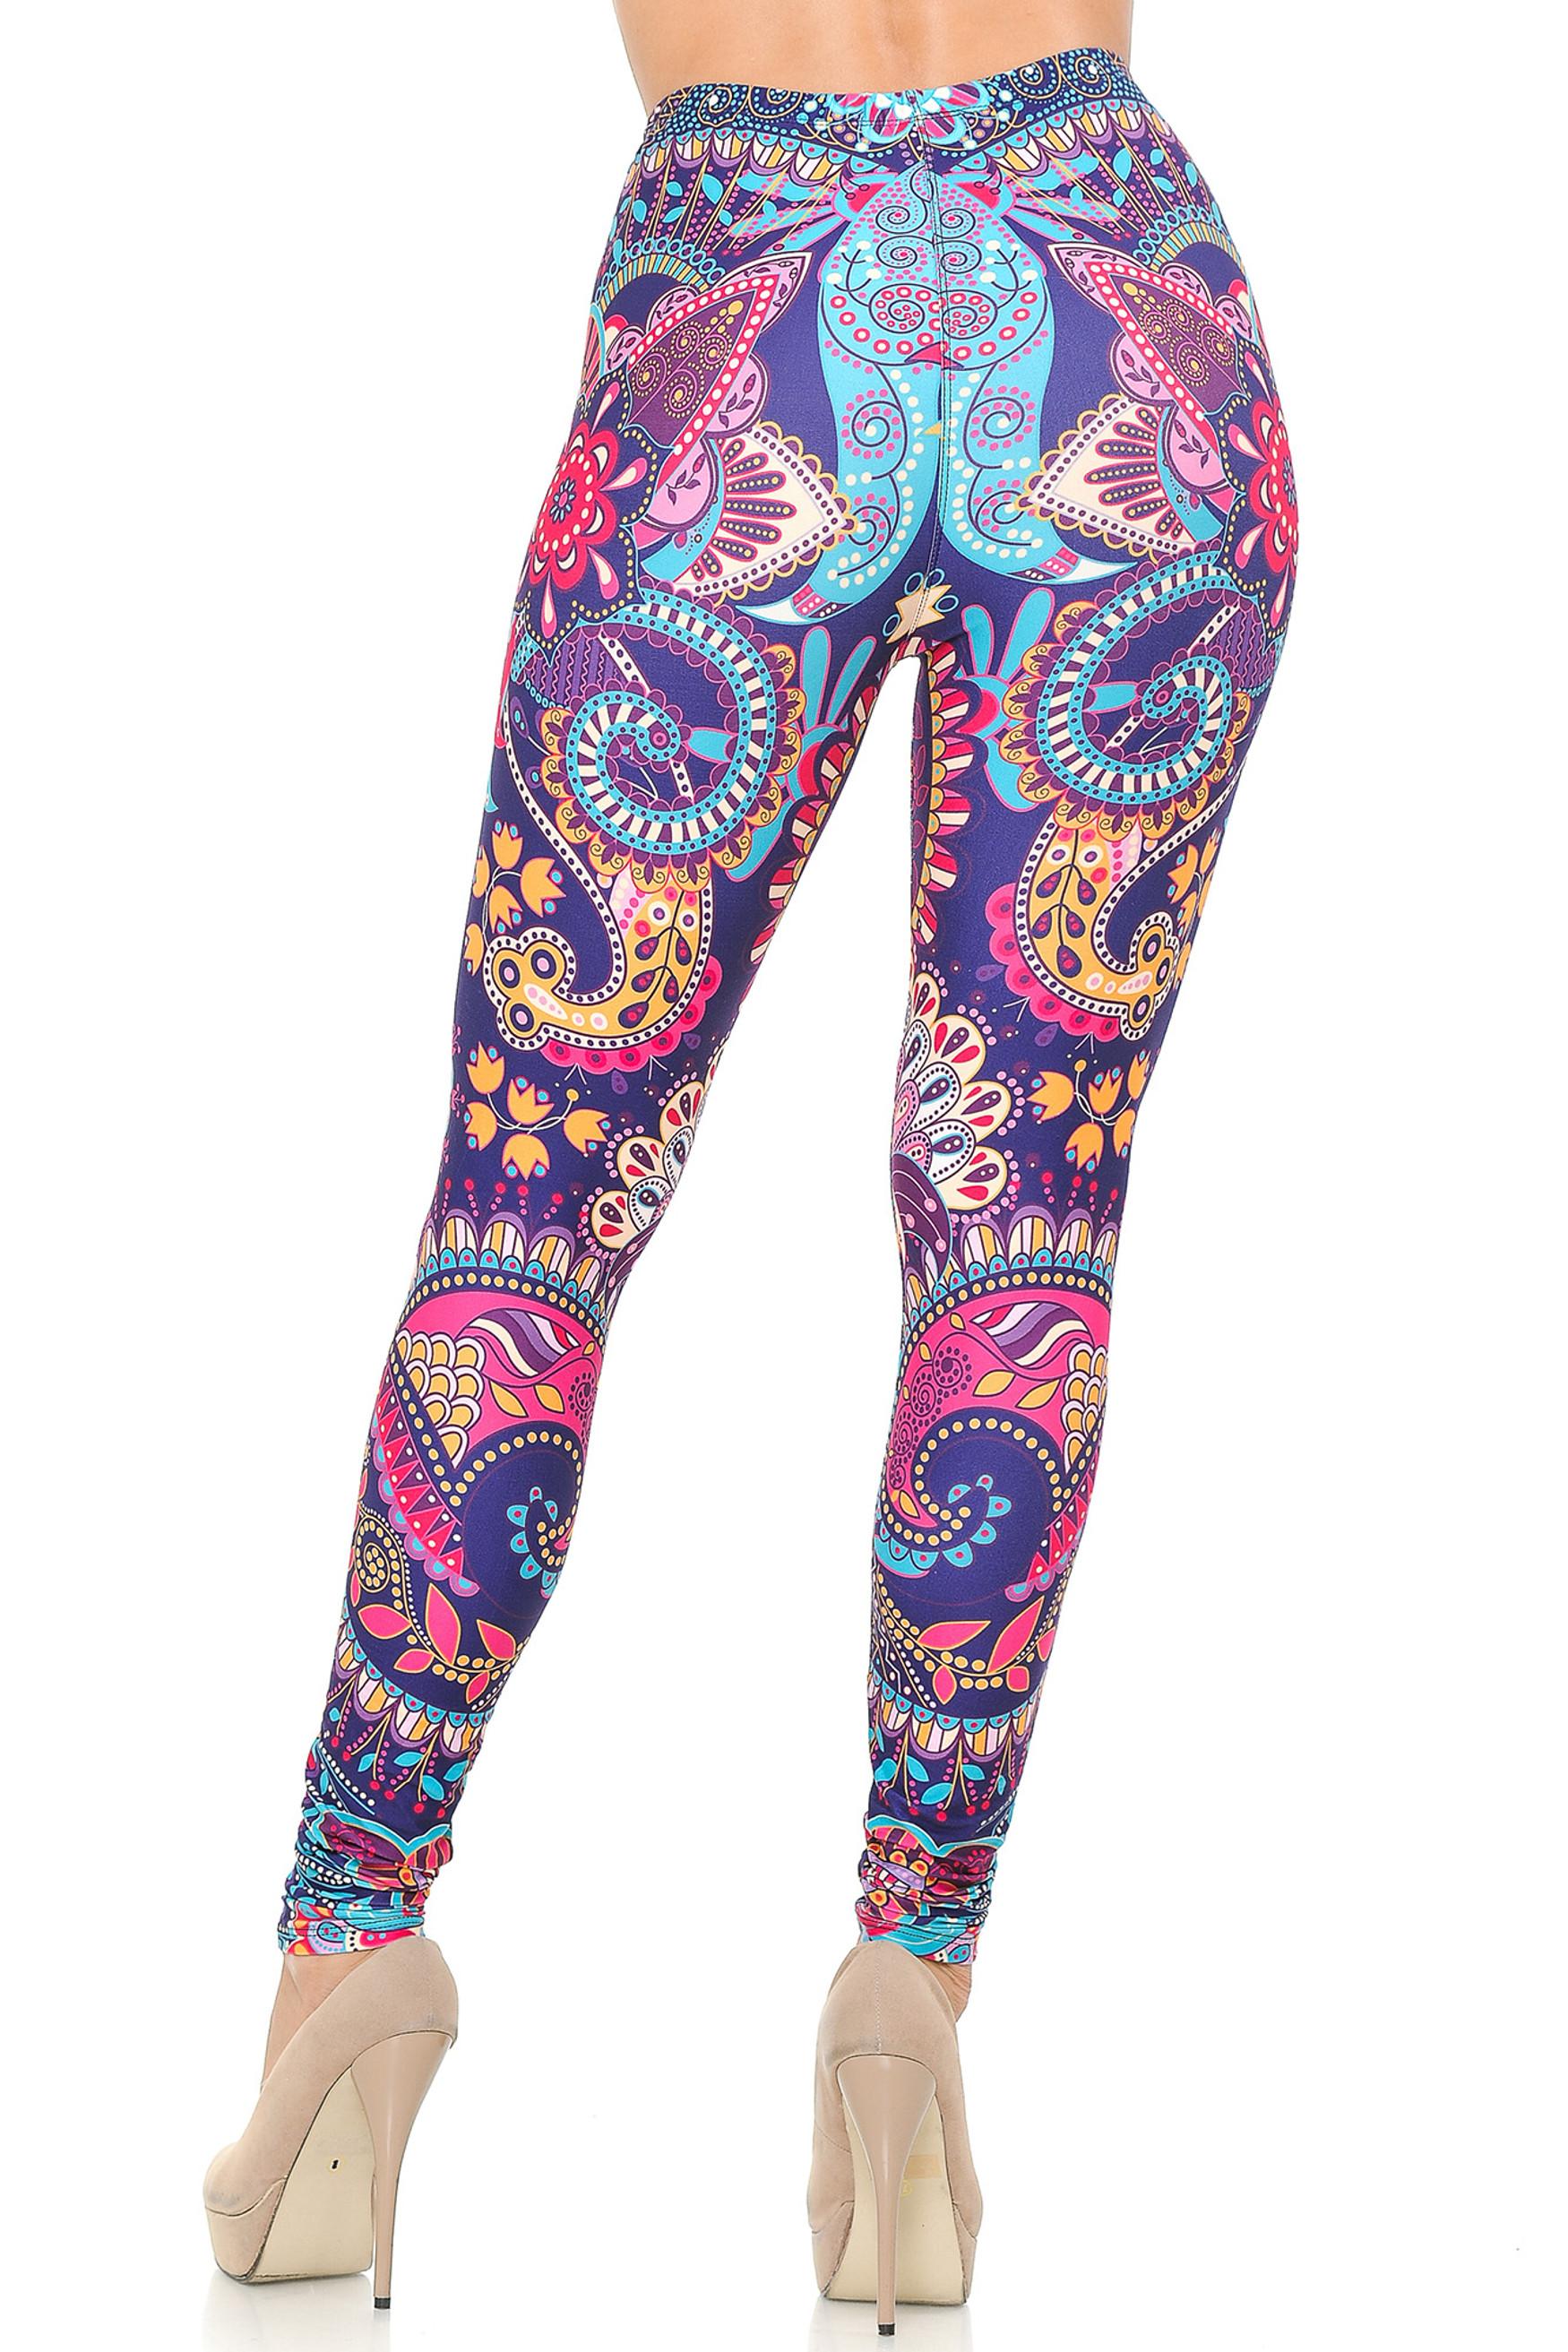 Creamy Soft Mandala Flowers Leggings - USA Fashion™